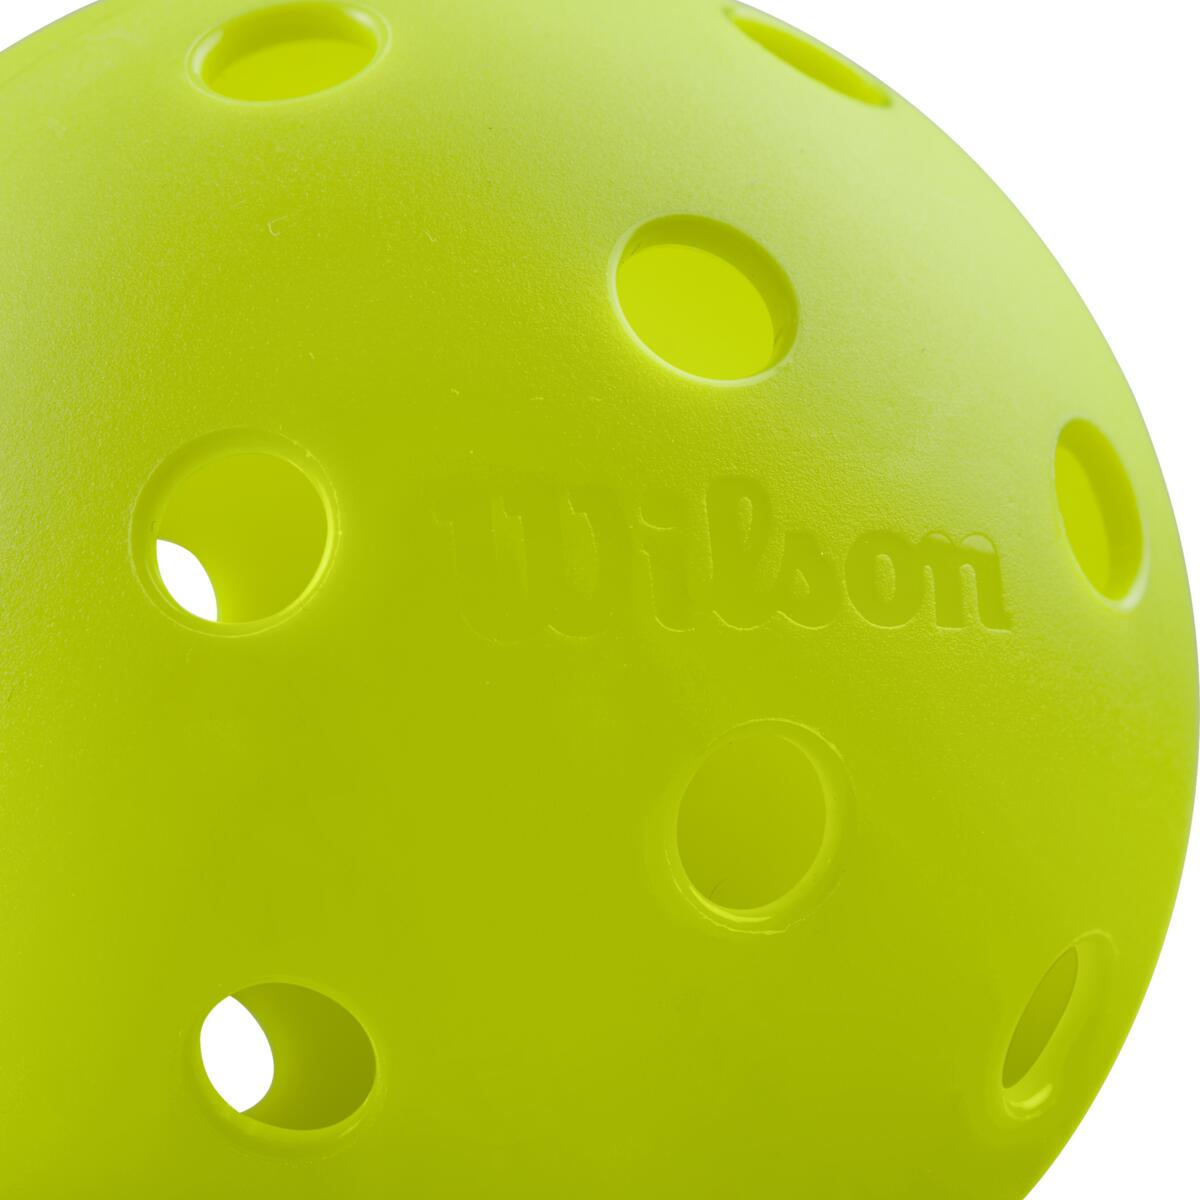 Wilson Tru 32 Pickleball Ball – 2 Pack